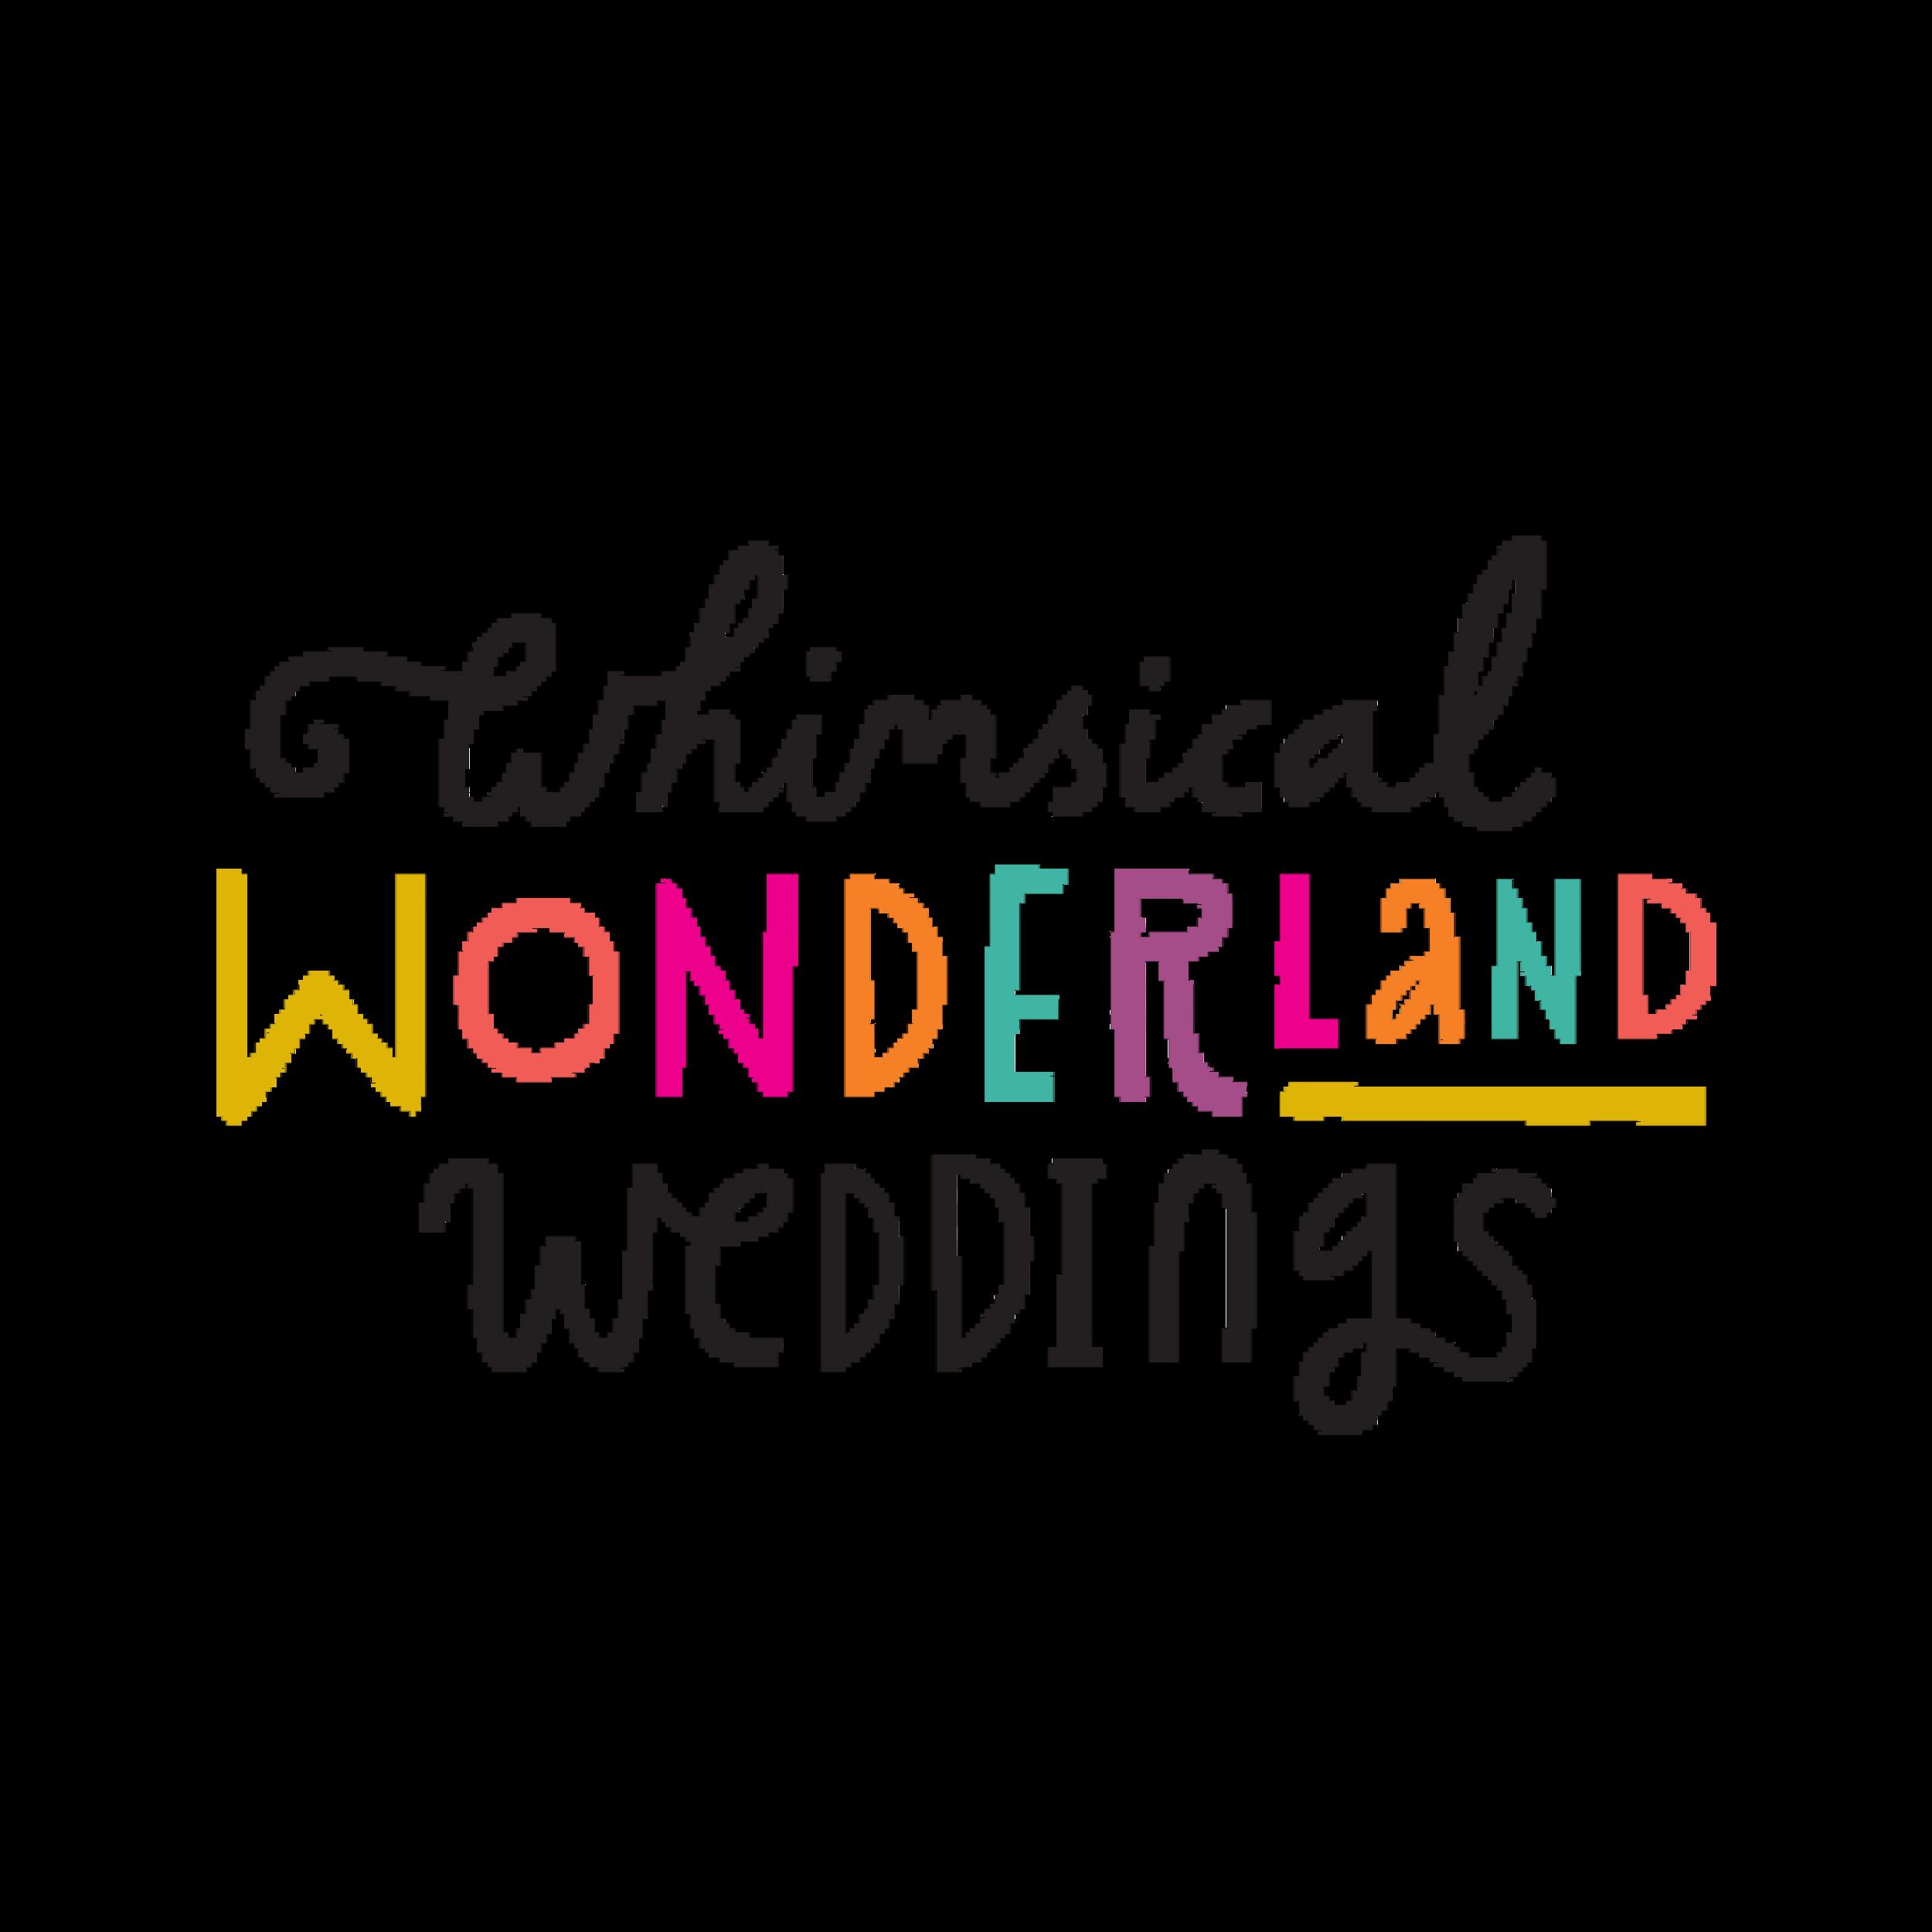 Terry Fox | Whimsical Wonderland Weddings